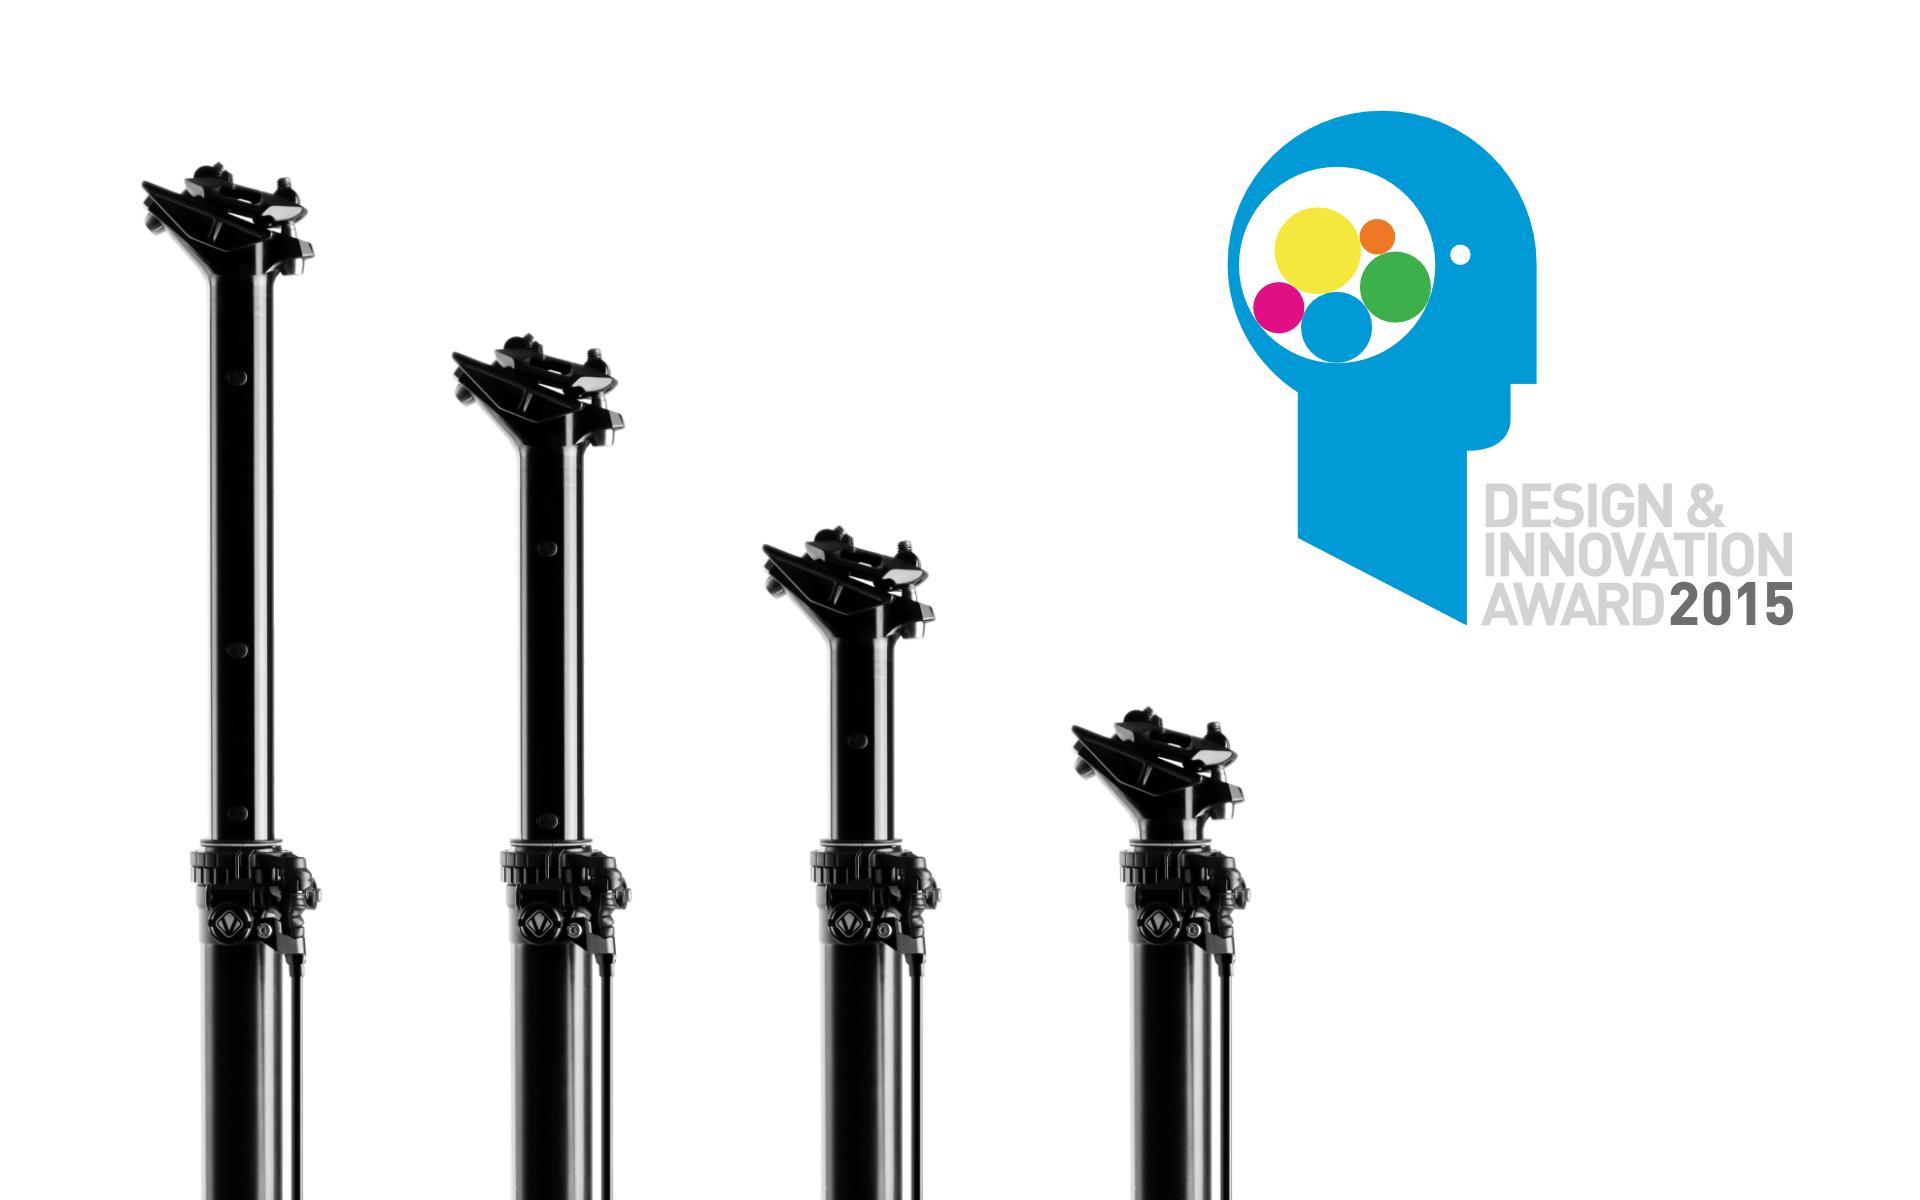 vecnum-moveloc-absenkbare-sattelstuetze-enduro-design-und-innovation-award-2015.jpg